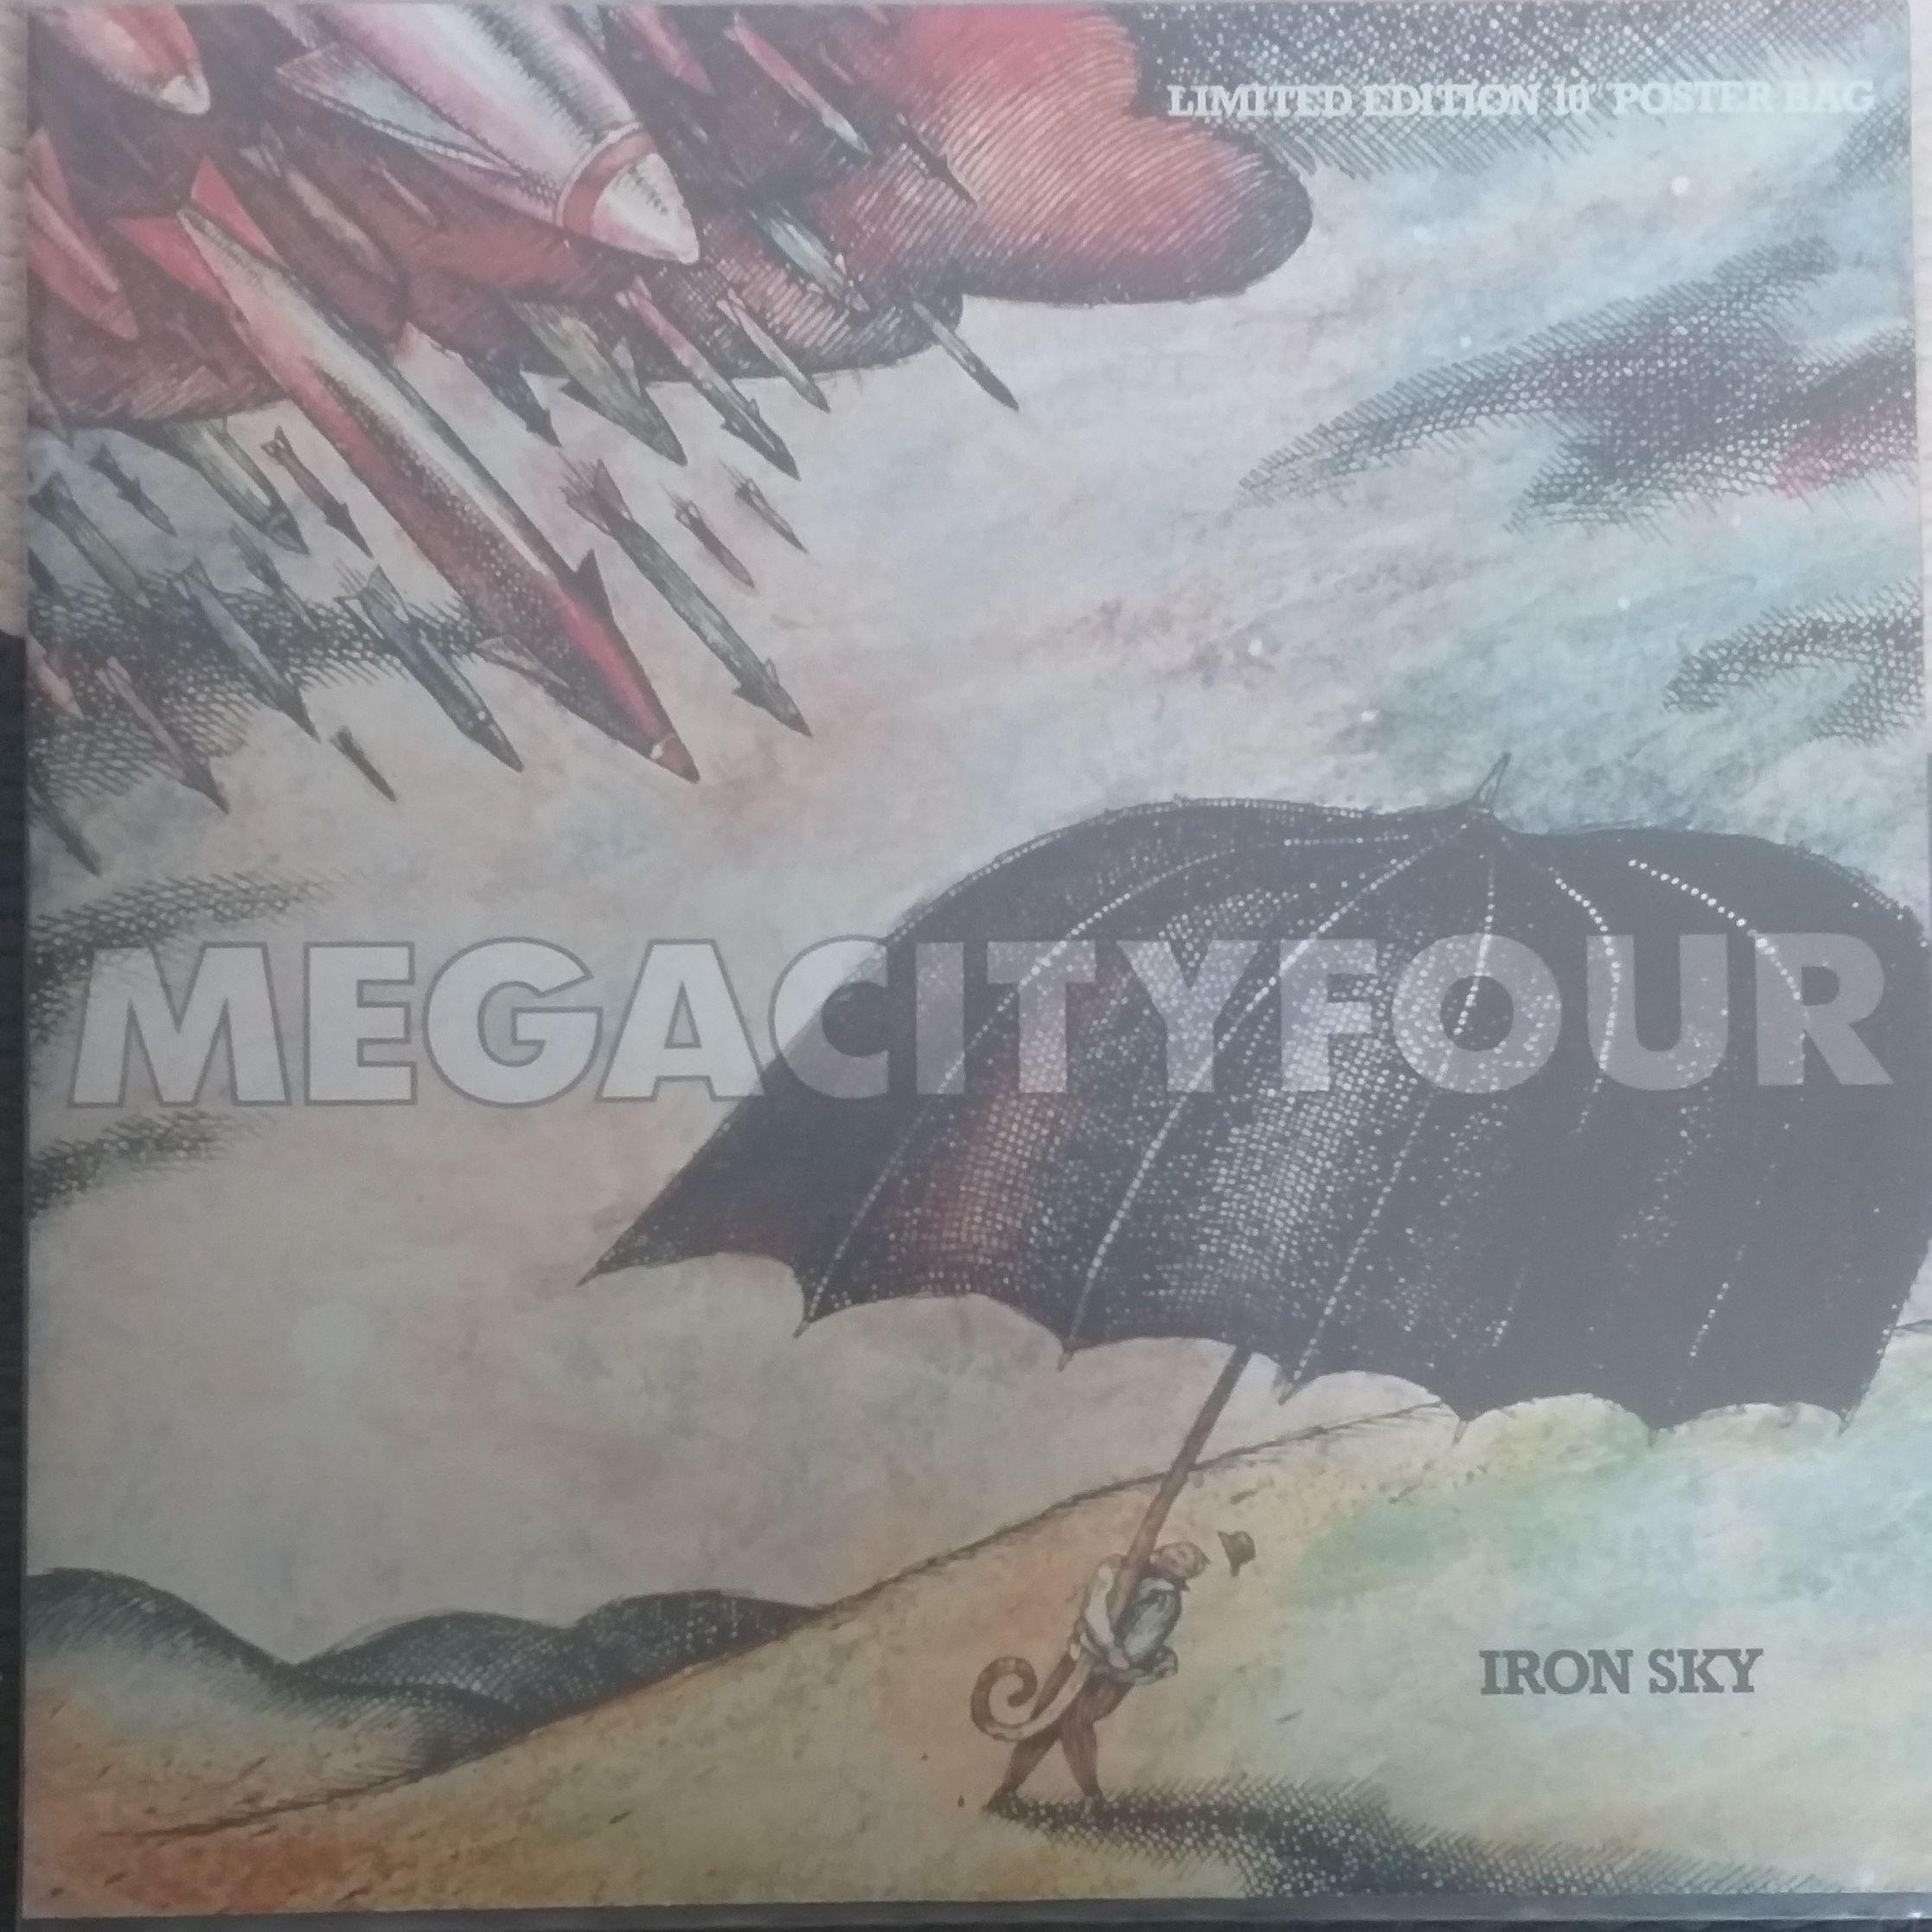 Mega city four Iron sky LP undefined